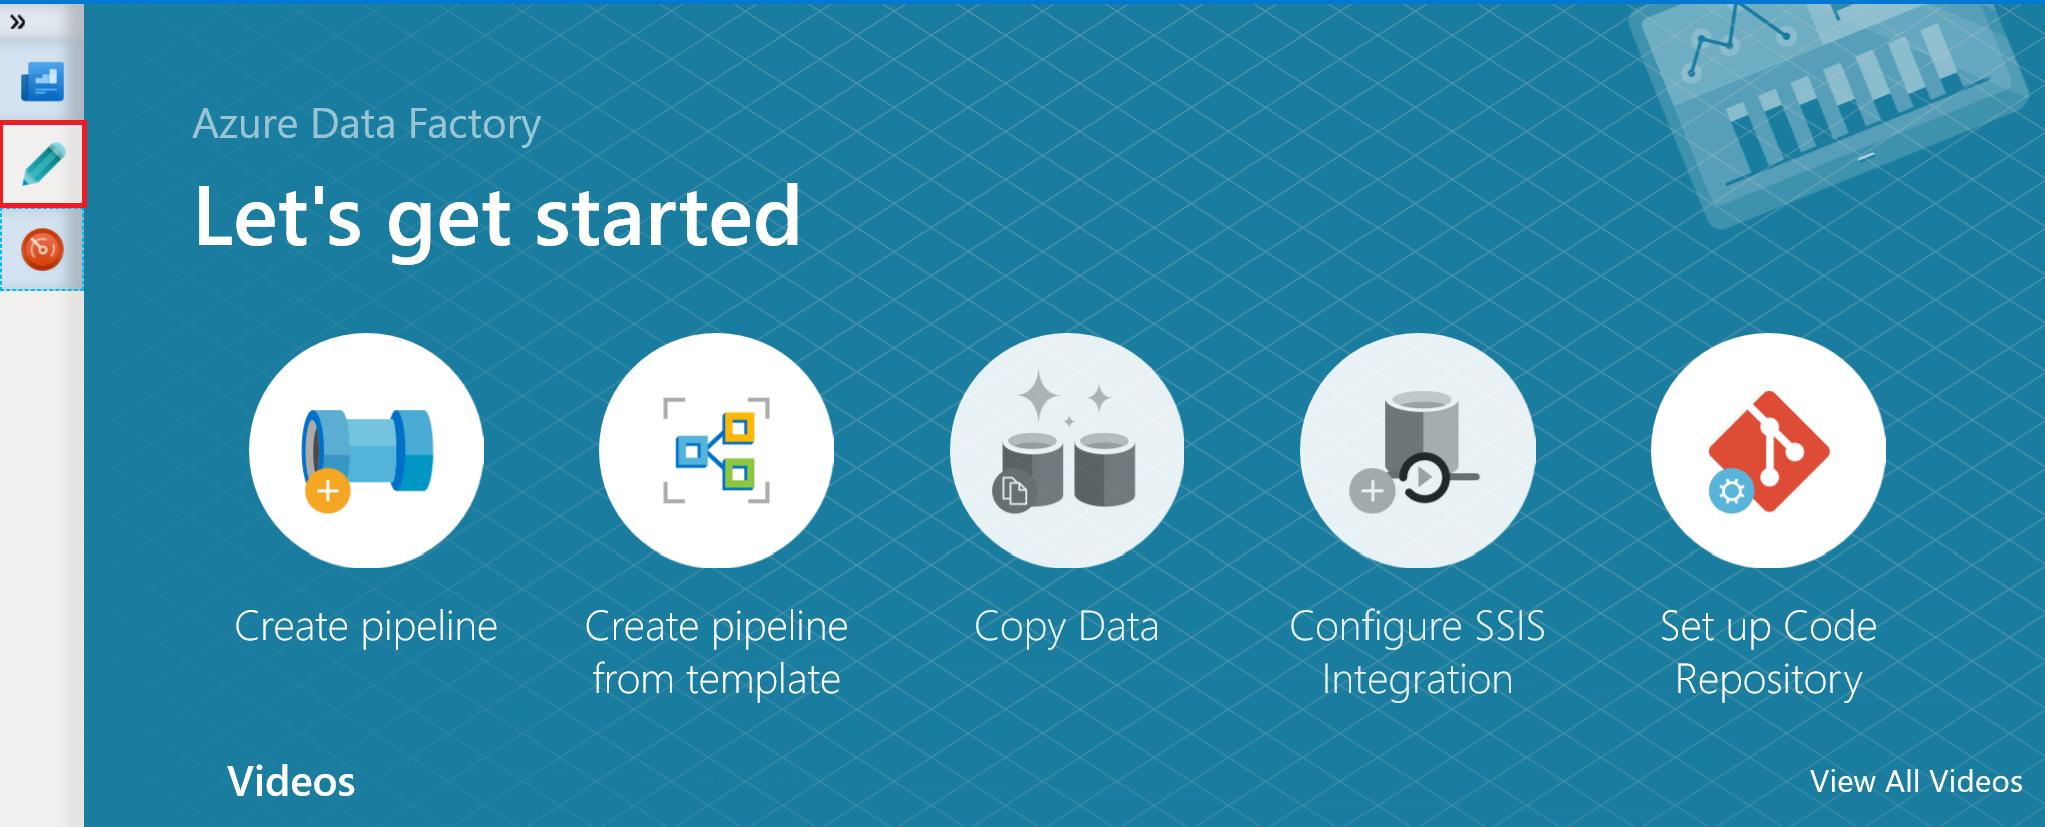 azure data factory tutorial pdf